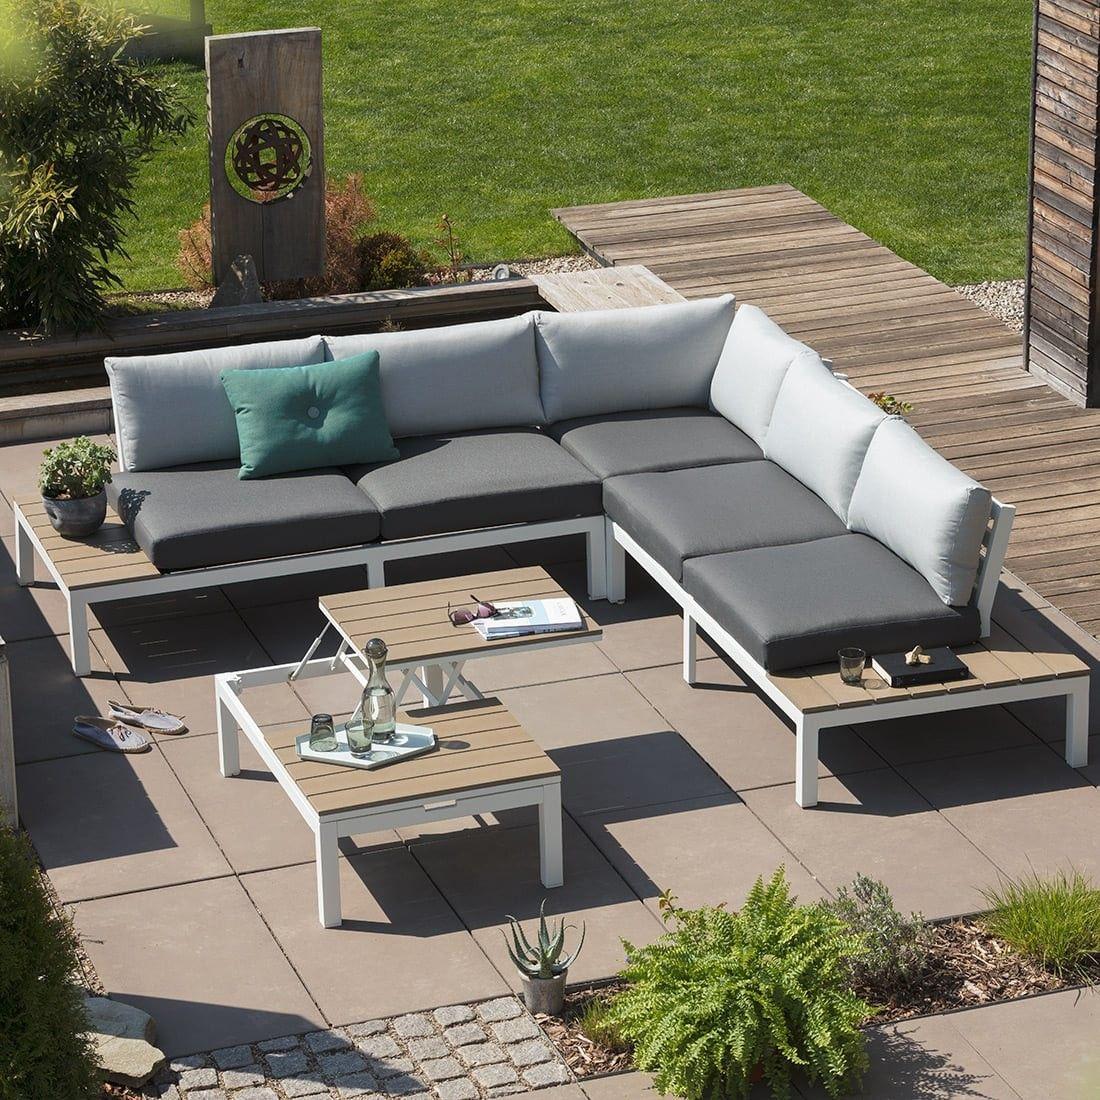 Full Size of Outliv Loungemöbel Hamilton Loungeecke 4 Teilig Aluminium Polywood In 2020 Garten Günstig Holz Wohnzimmer Outliv Loungemöbel